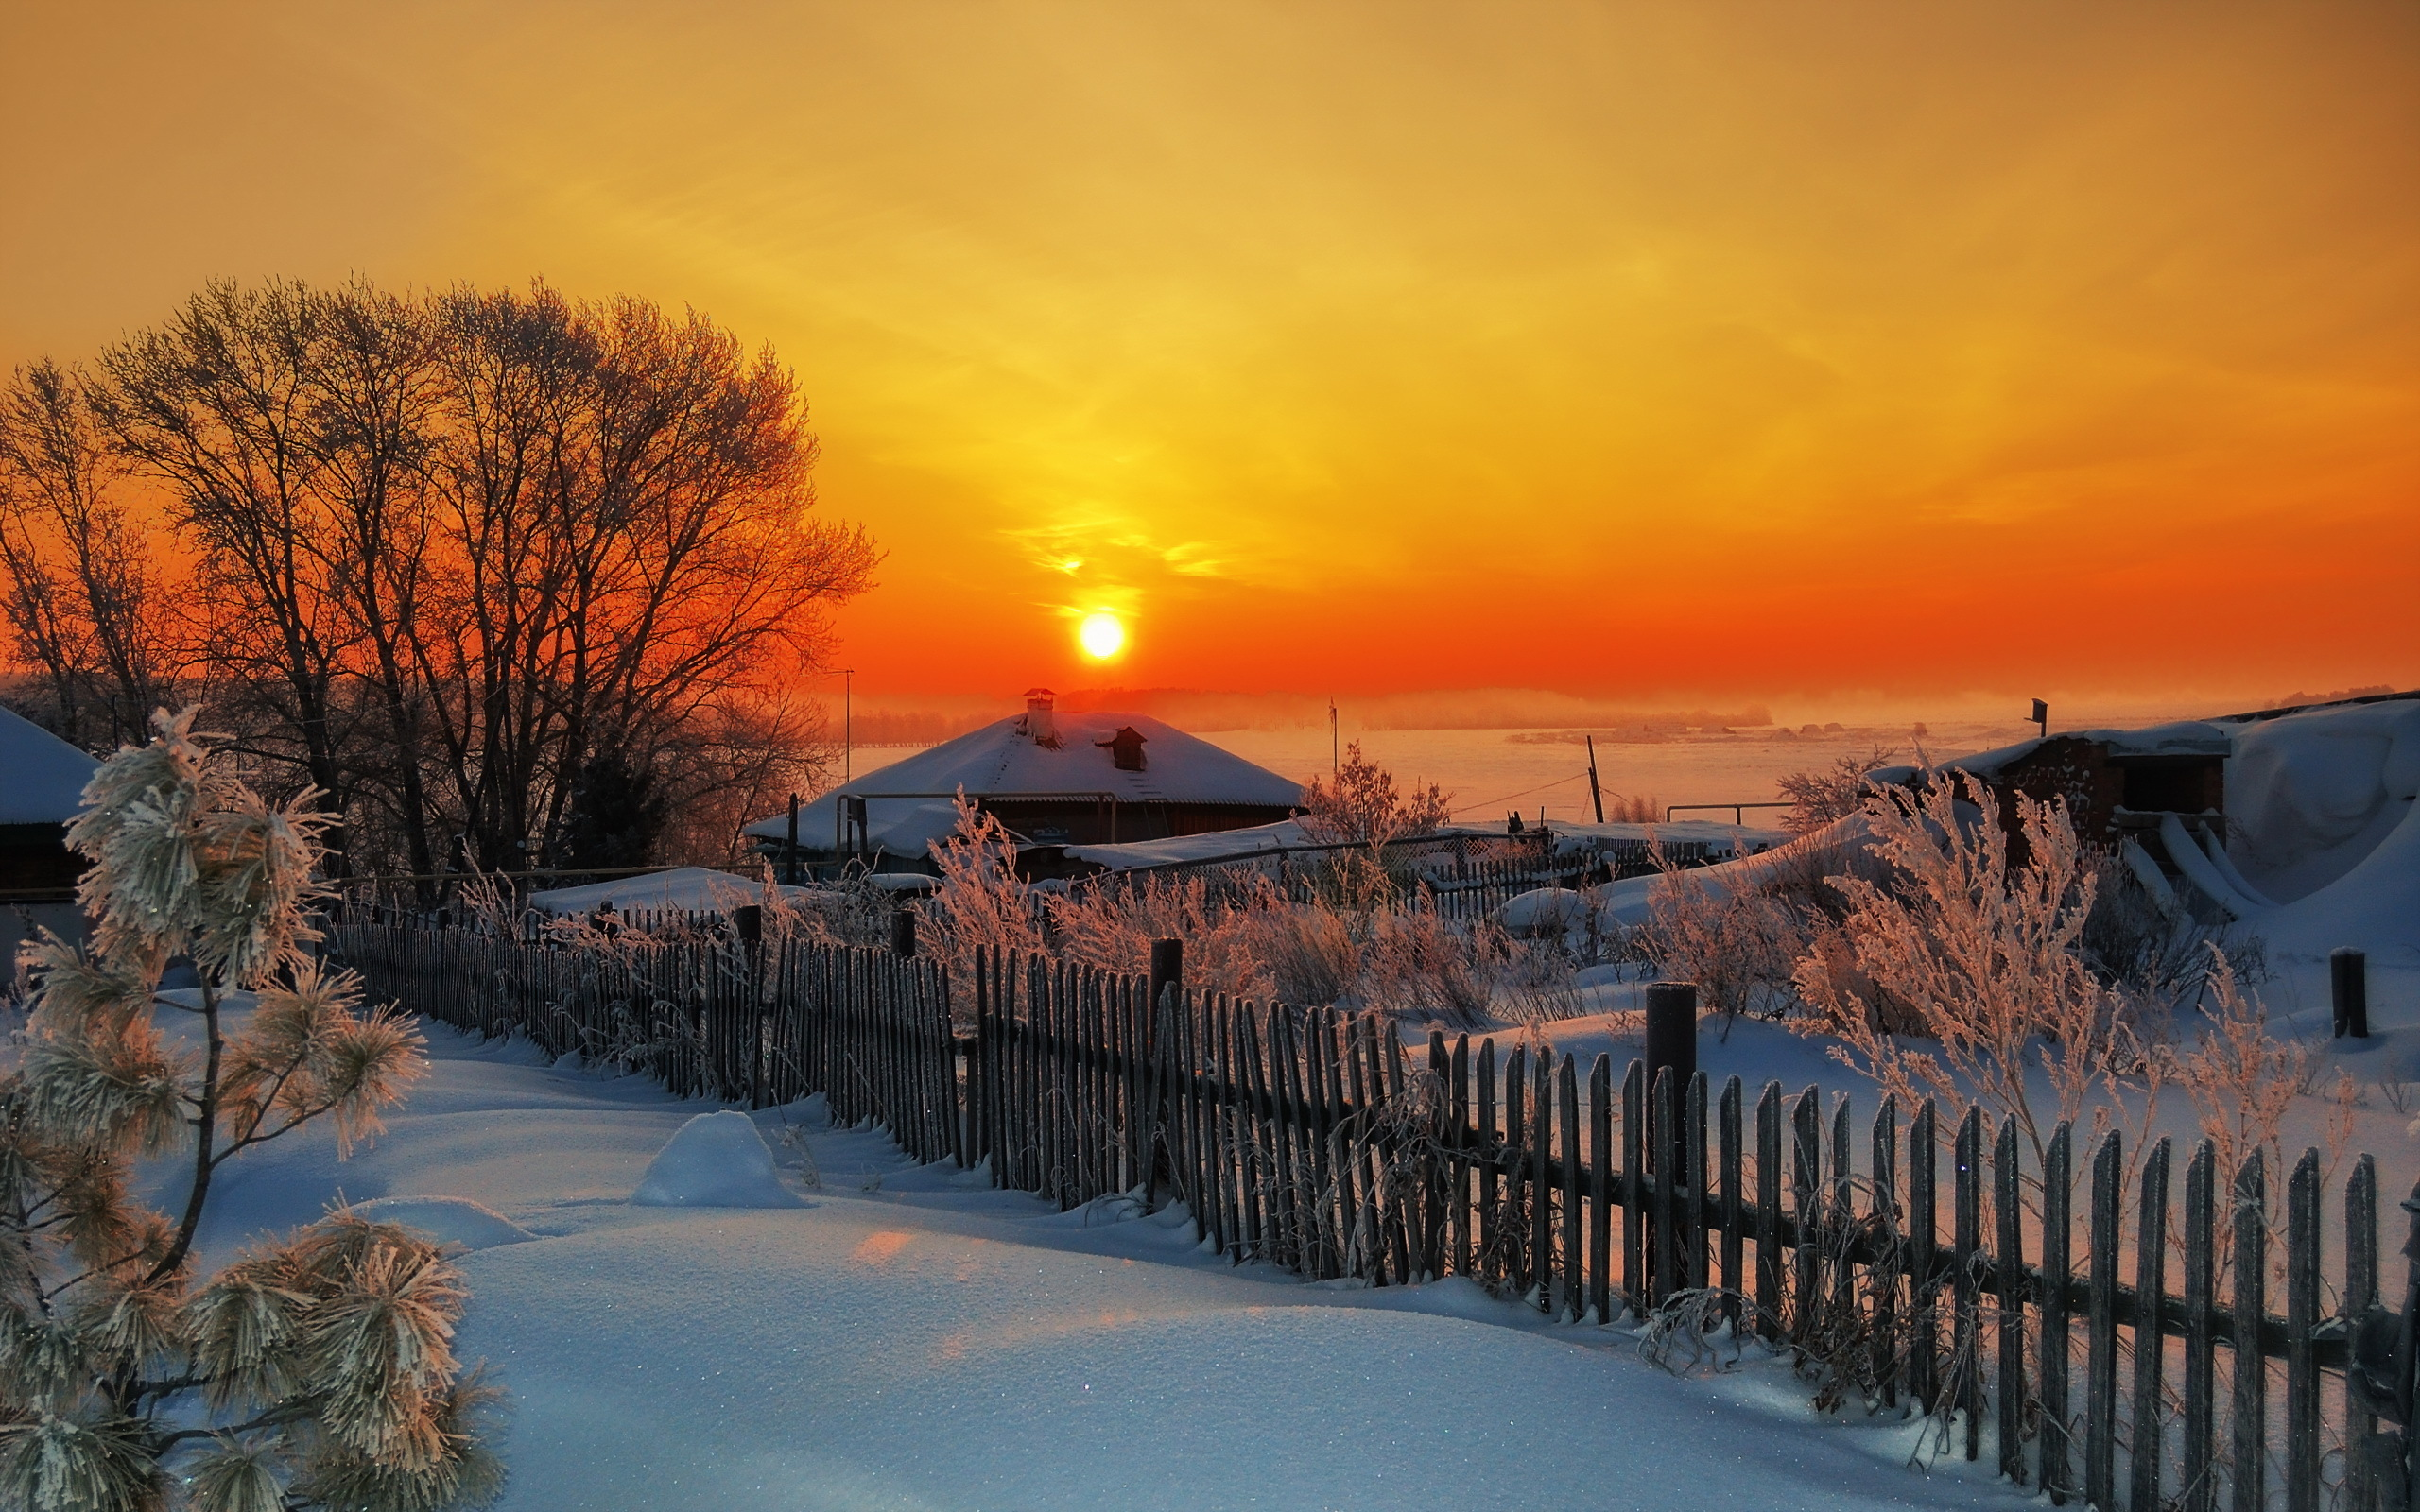 Зимняя деревня к картинках